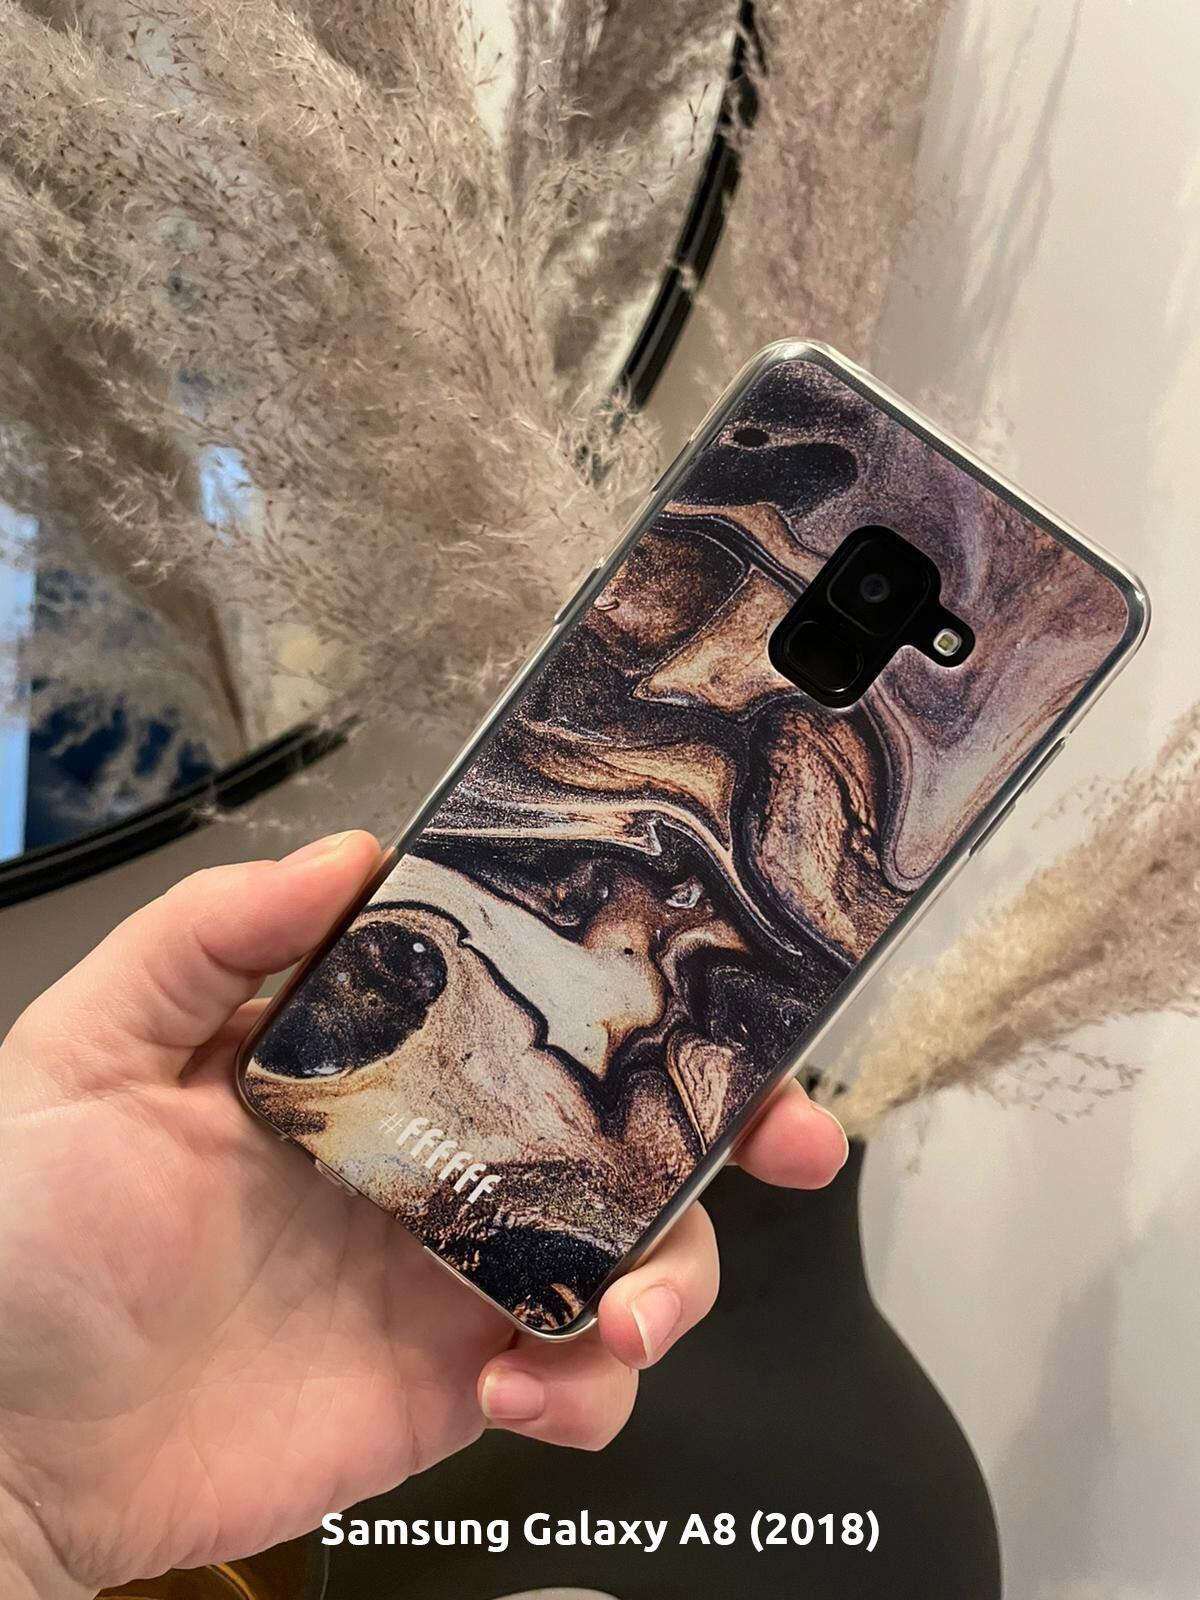 Wood Marble - Galaxy A8 (2018)